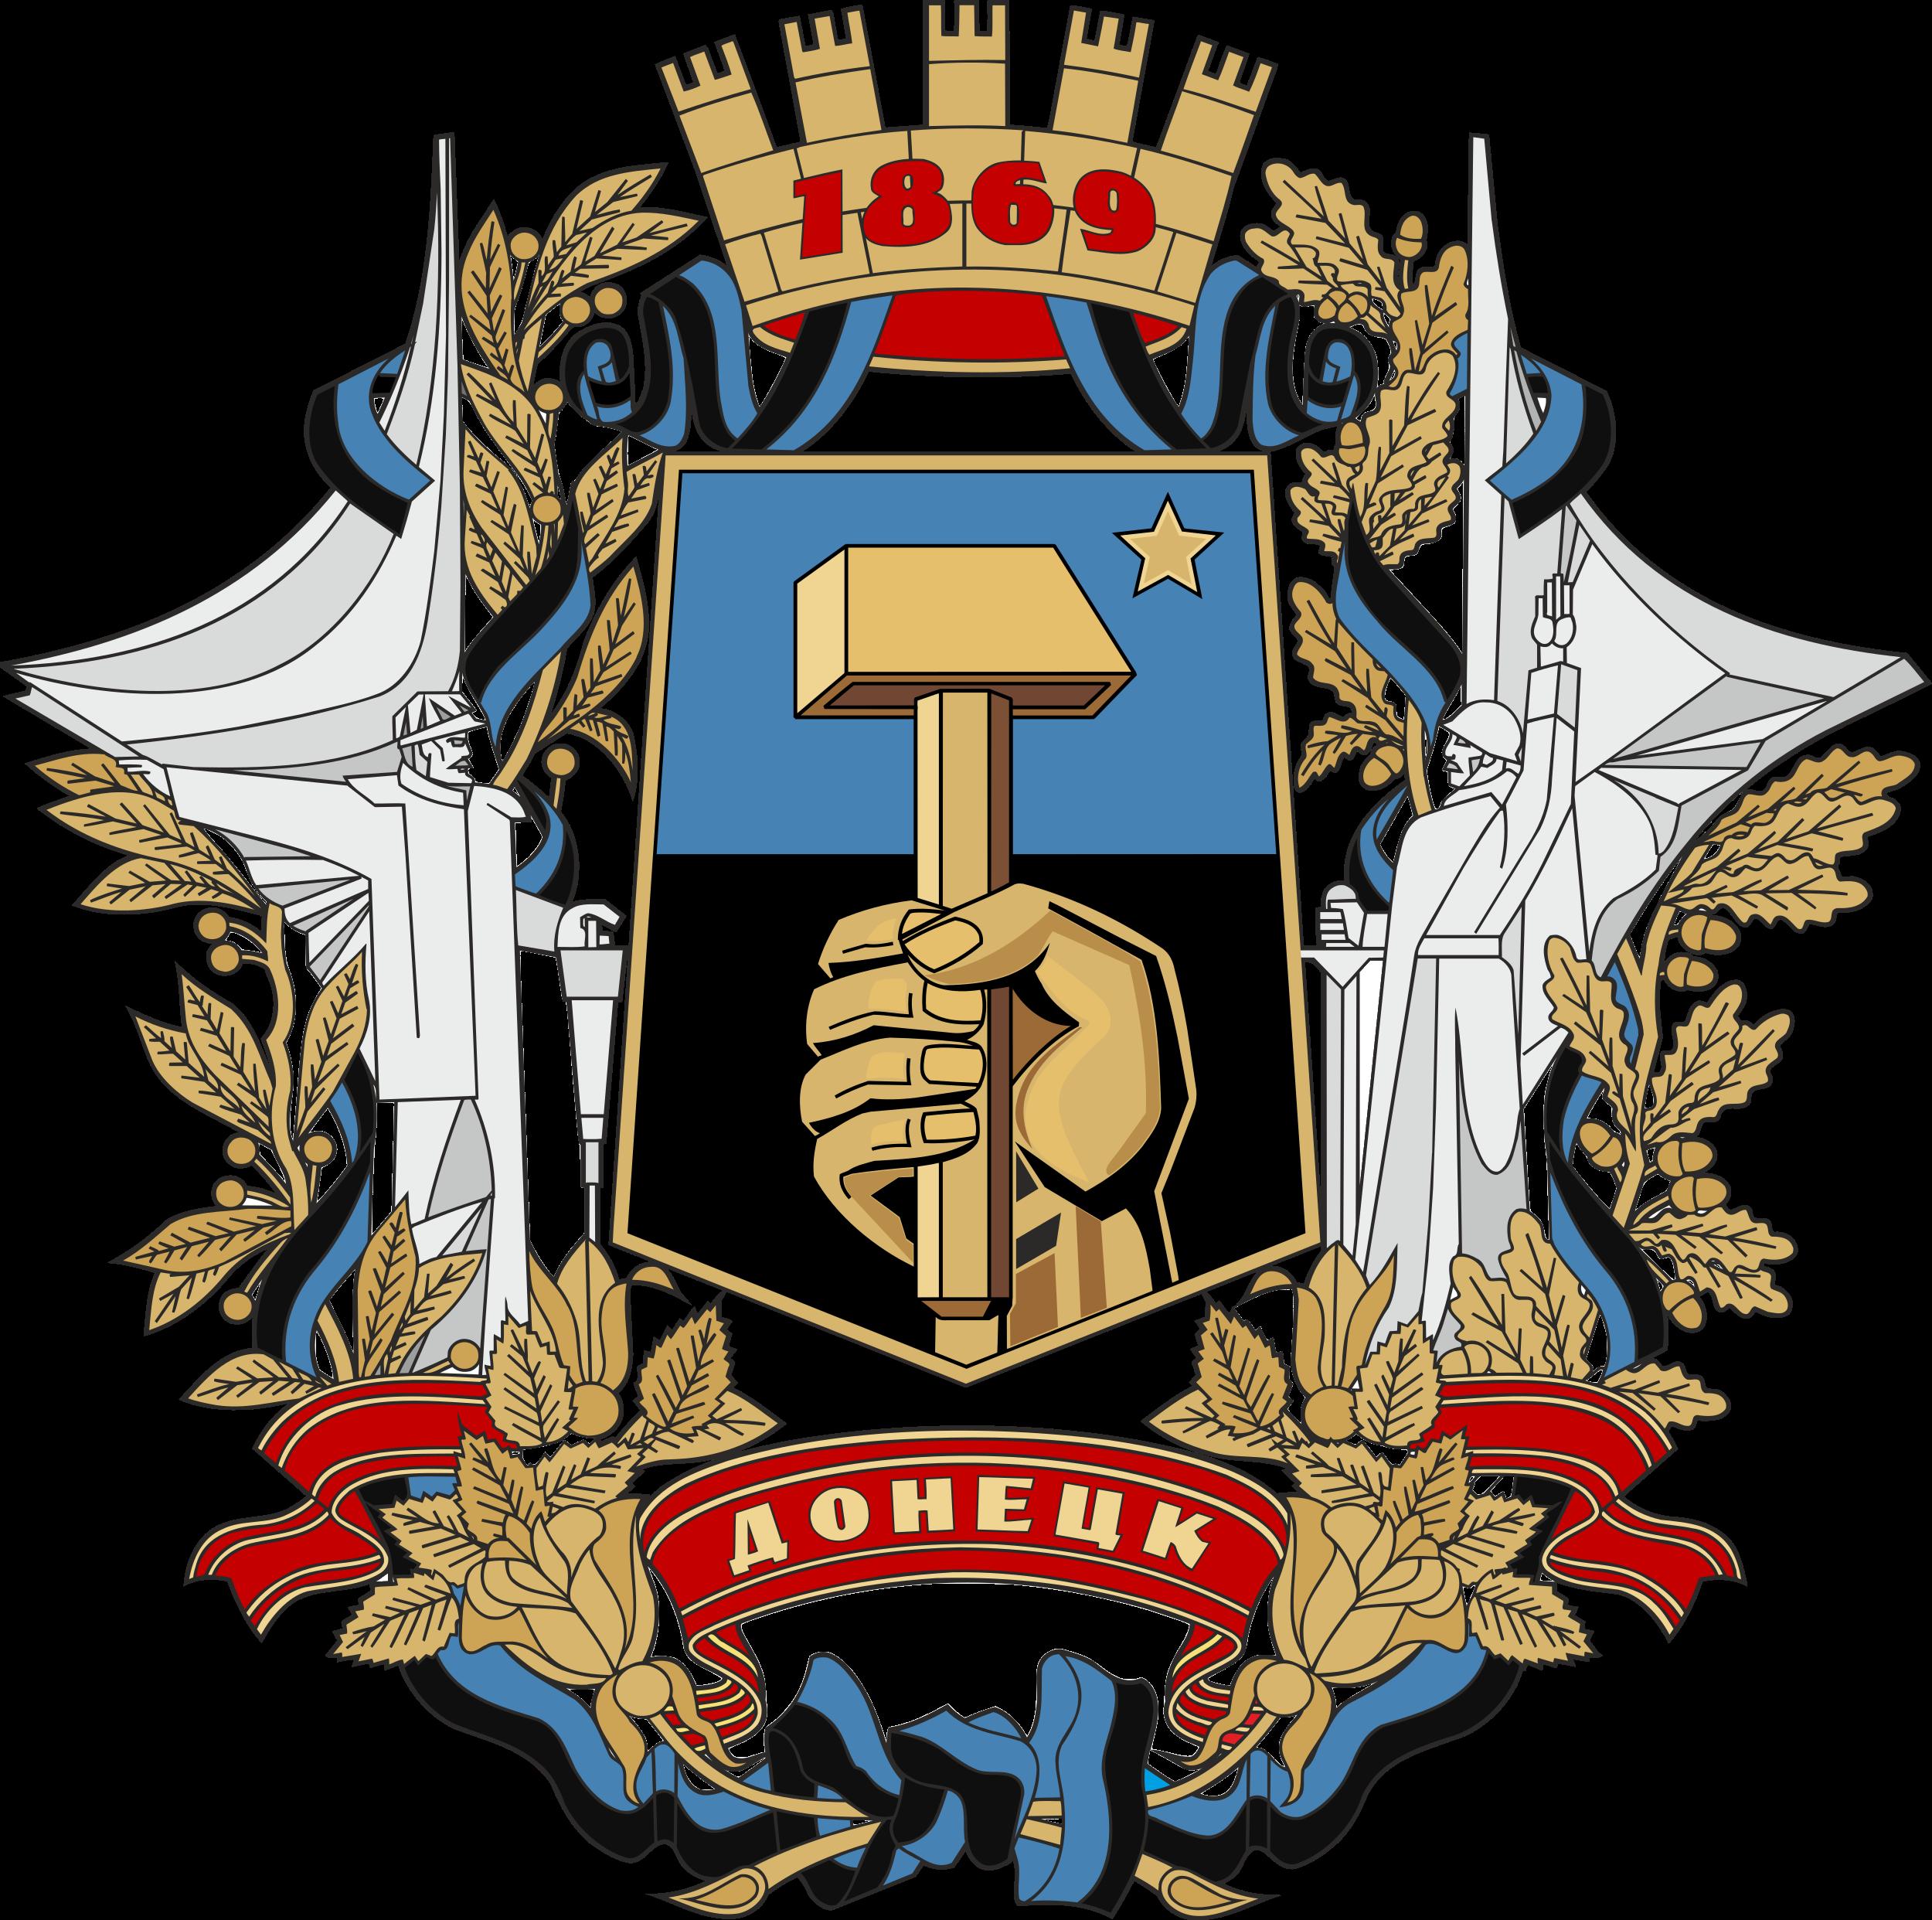 Ficheiro:Большой герб Донецка.png